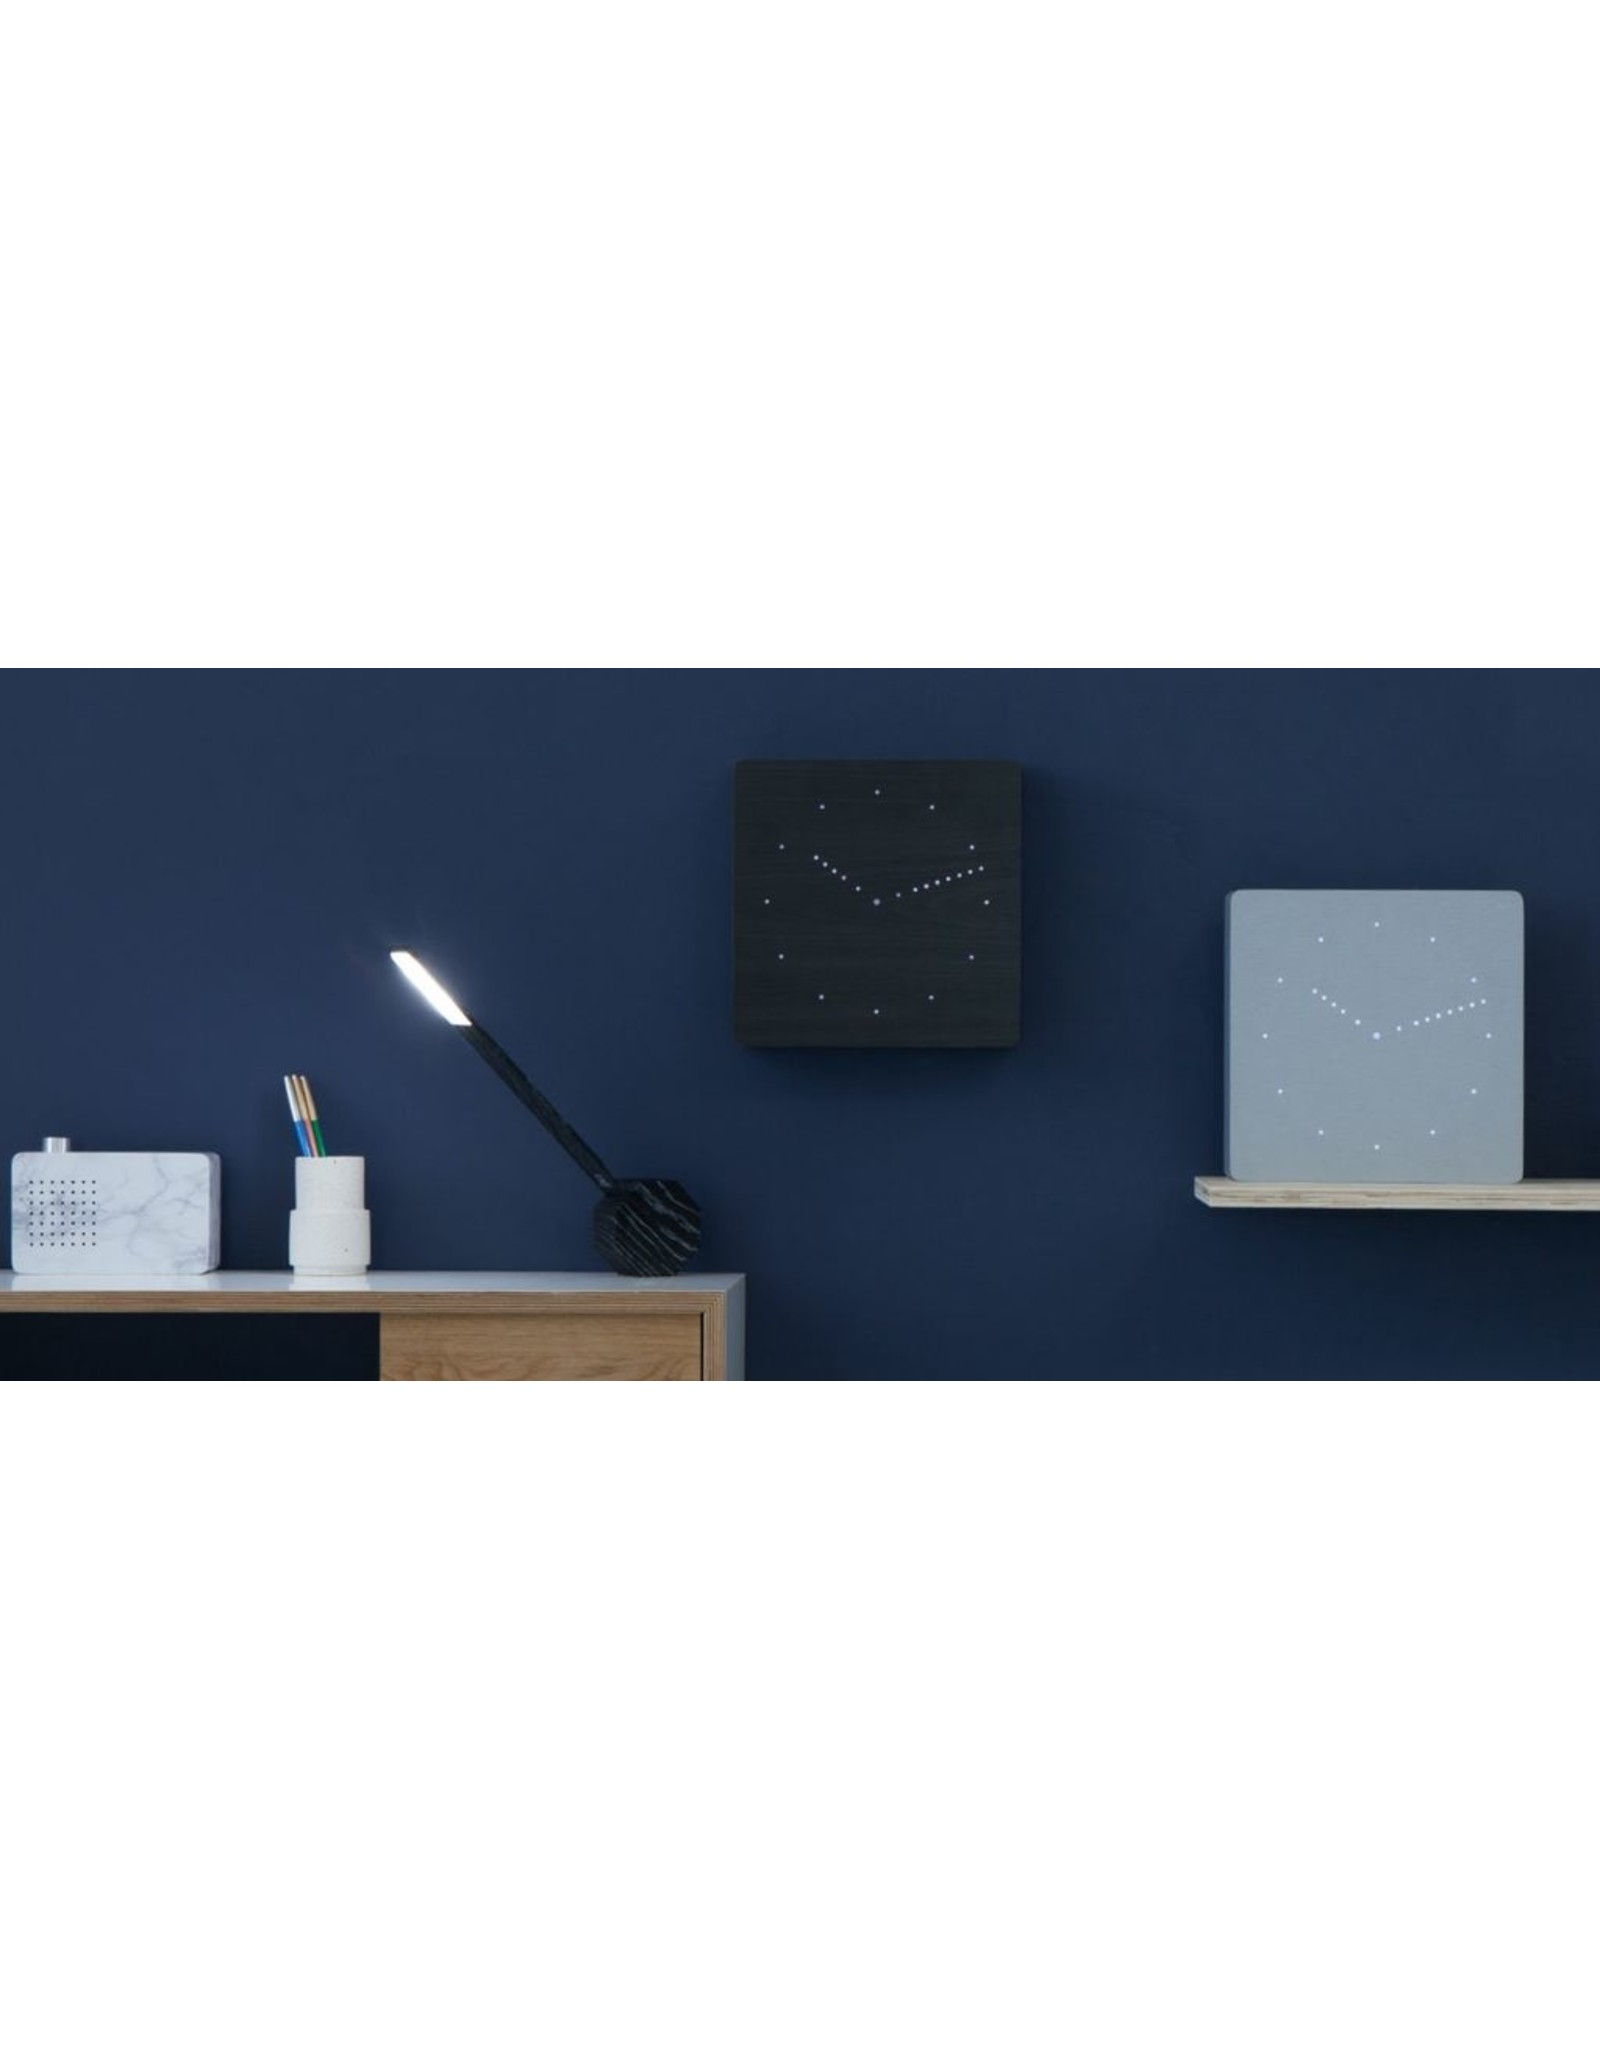 Gingko electronics LTD ANALOG CLOCK BLACK-WHITE LED